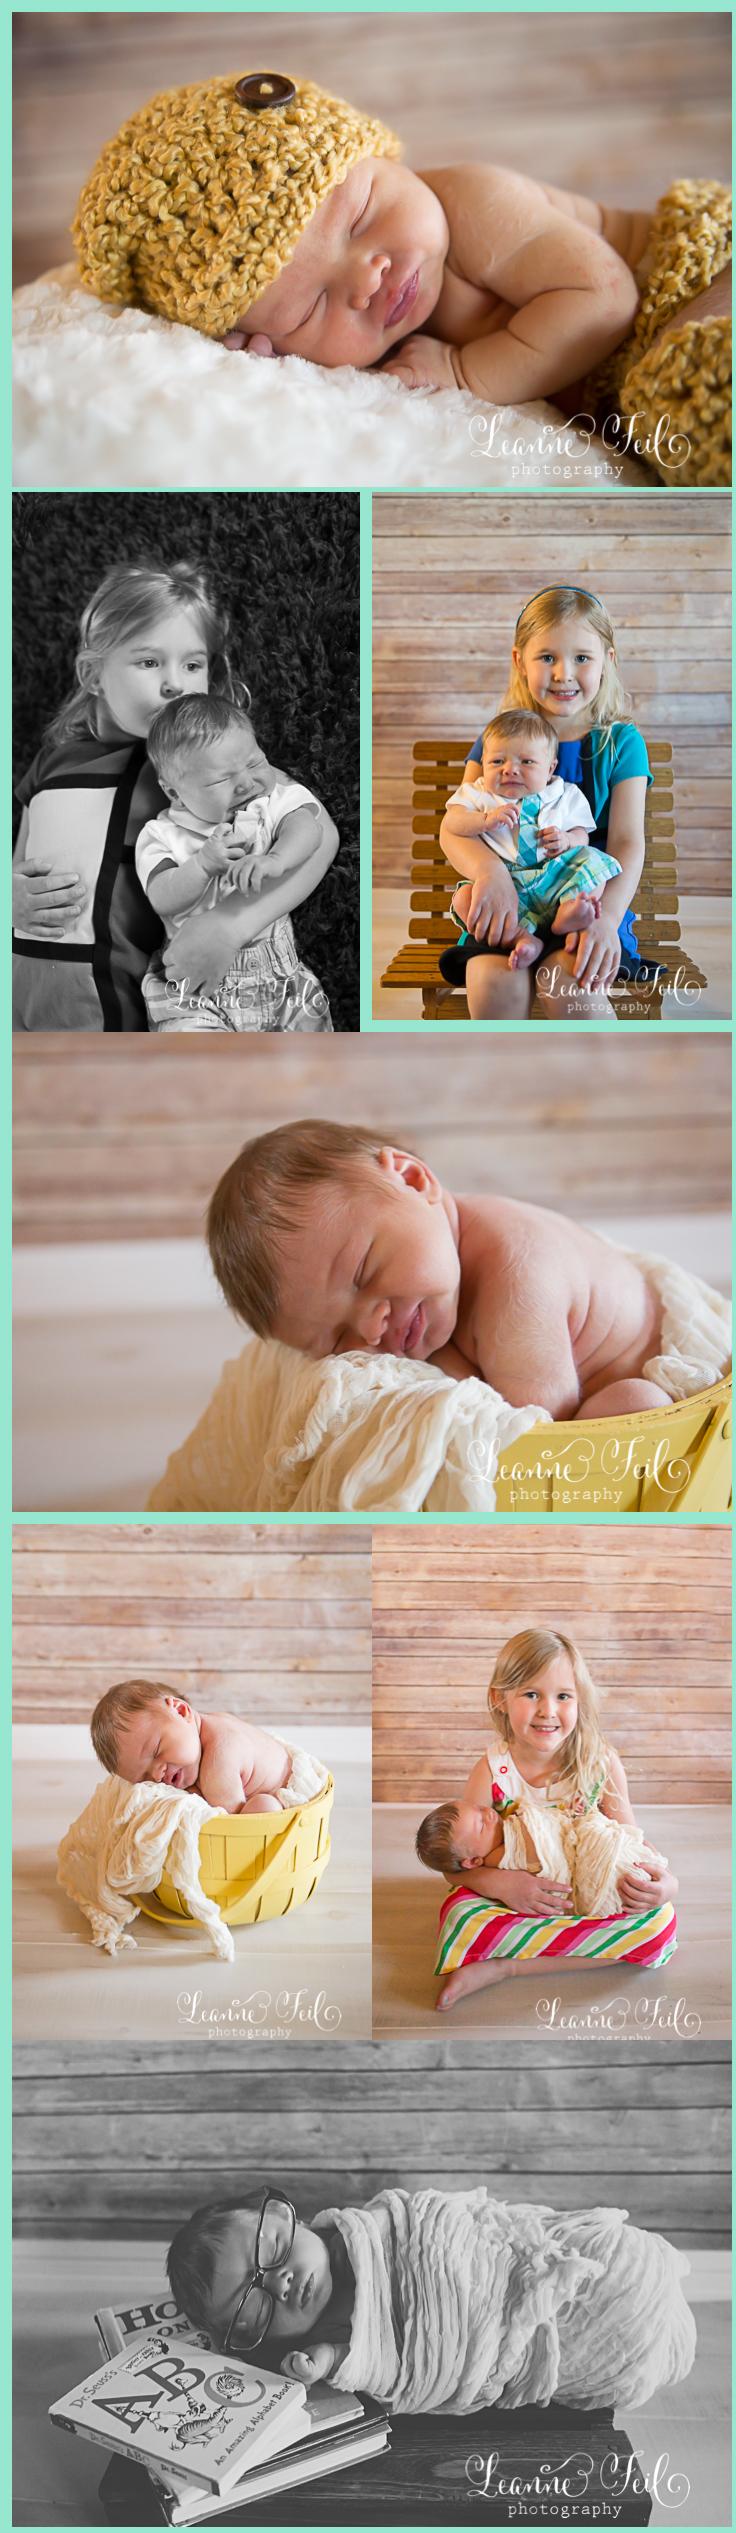 Leanne Feil Photography ~ Butler, PA Newborn Photographer